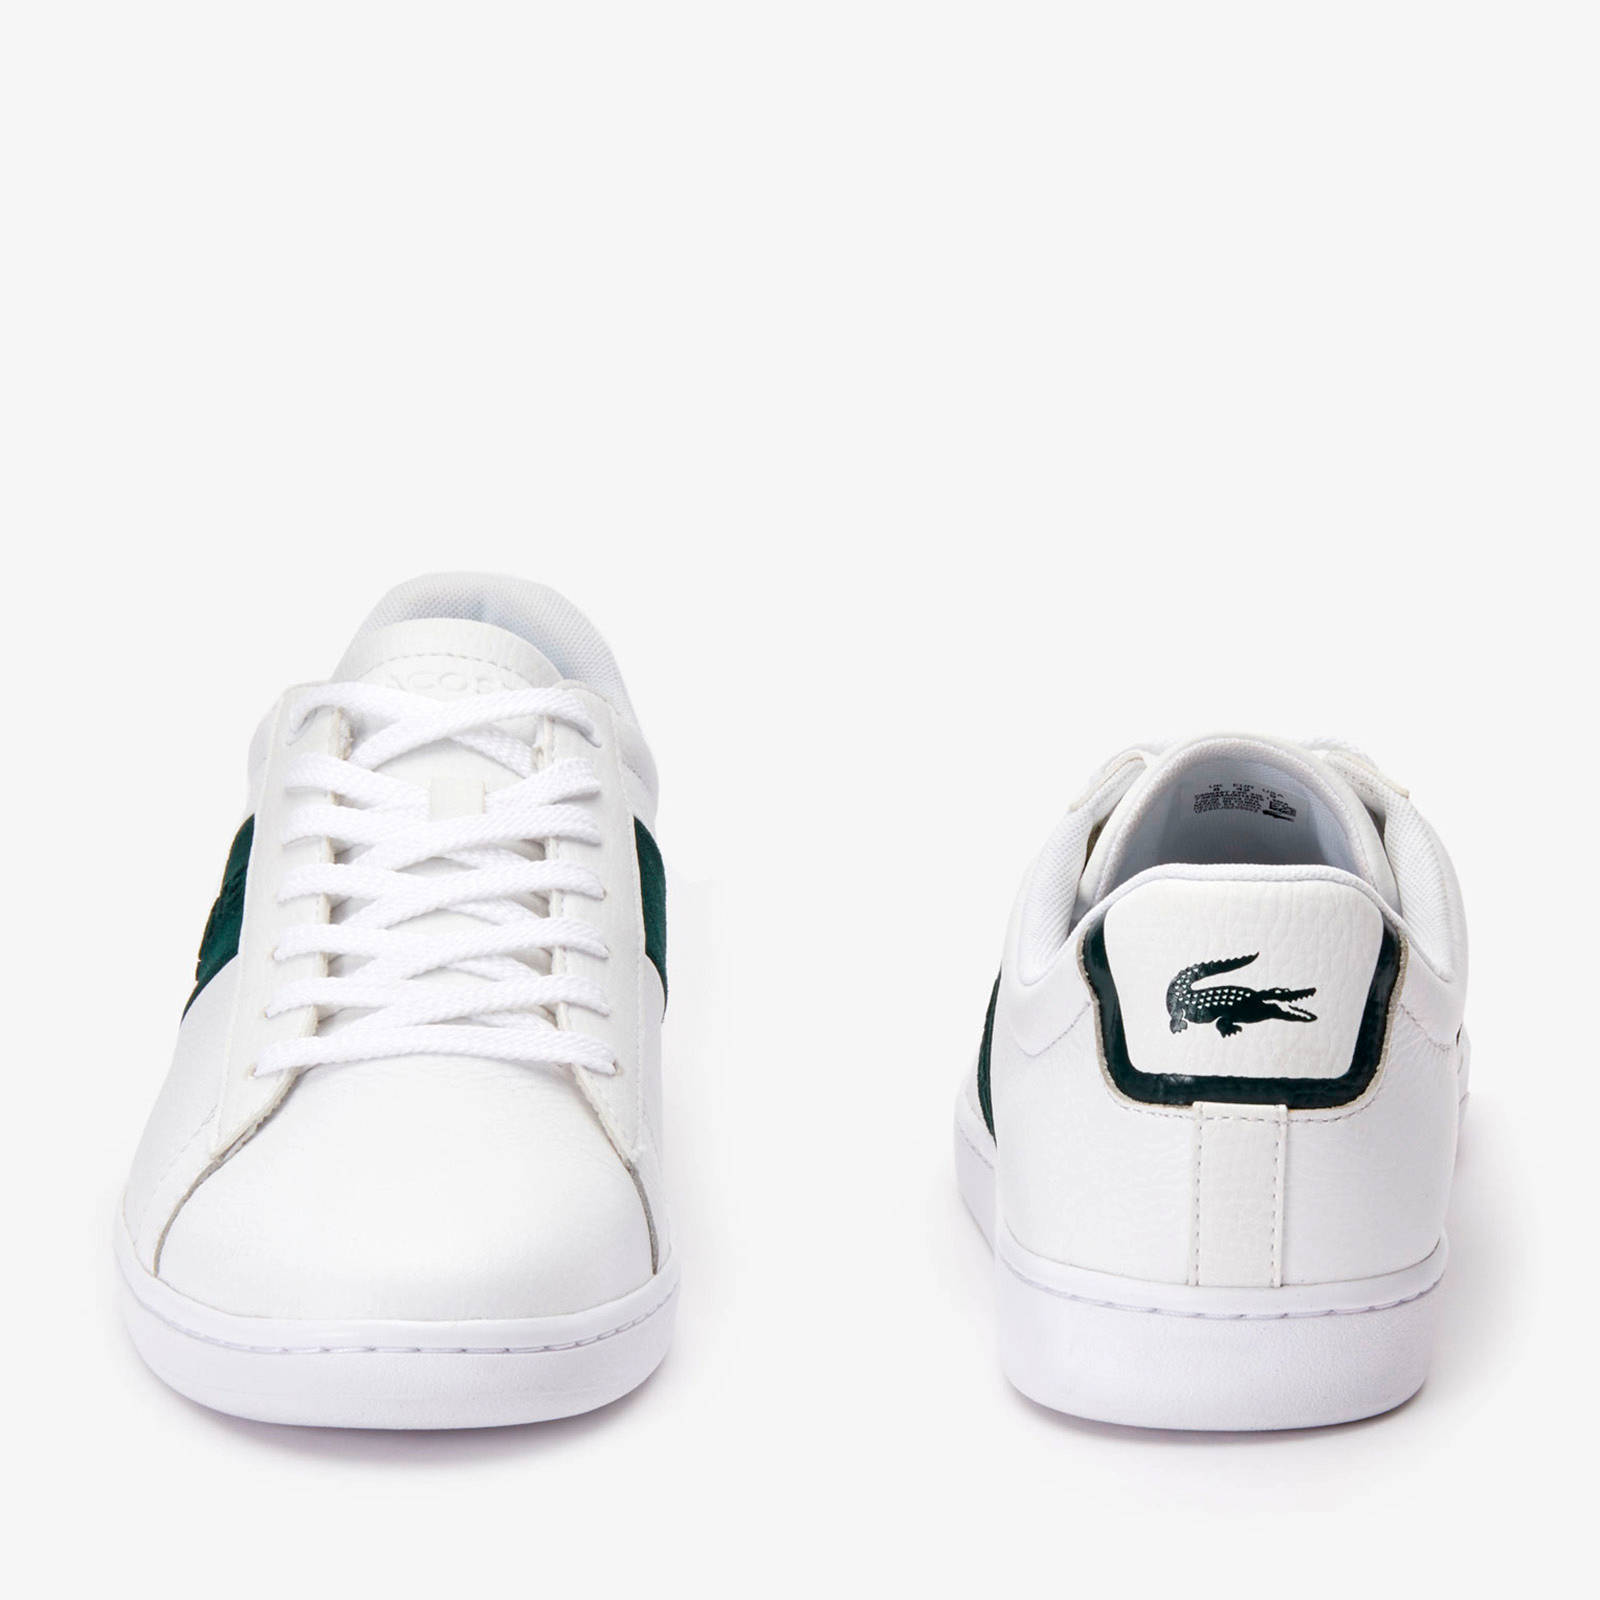 Lacoste Carnaby Evo 319 sneakers witgroen   wehkamp